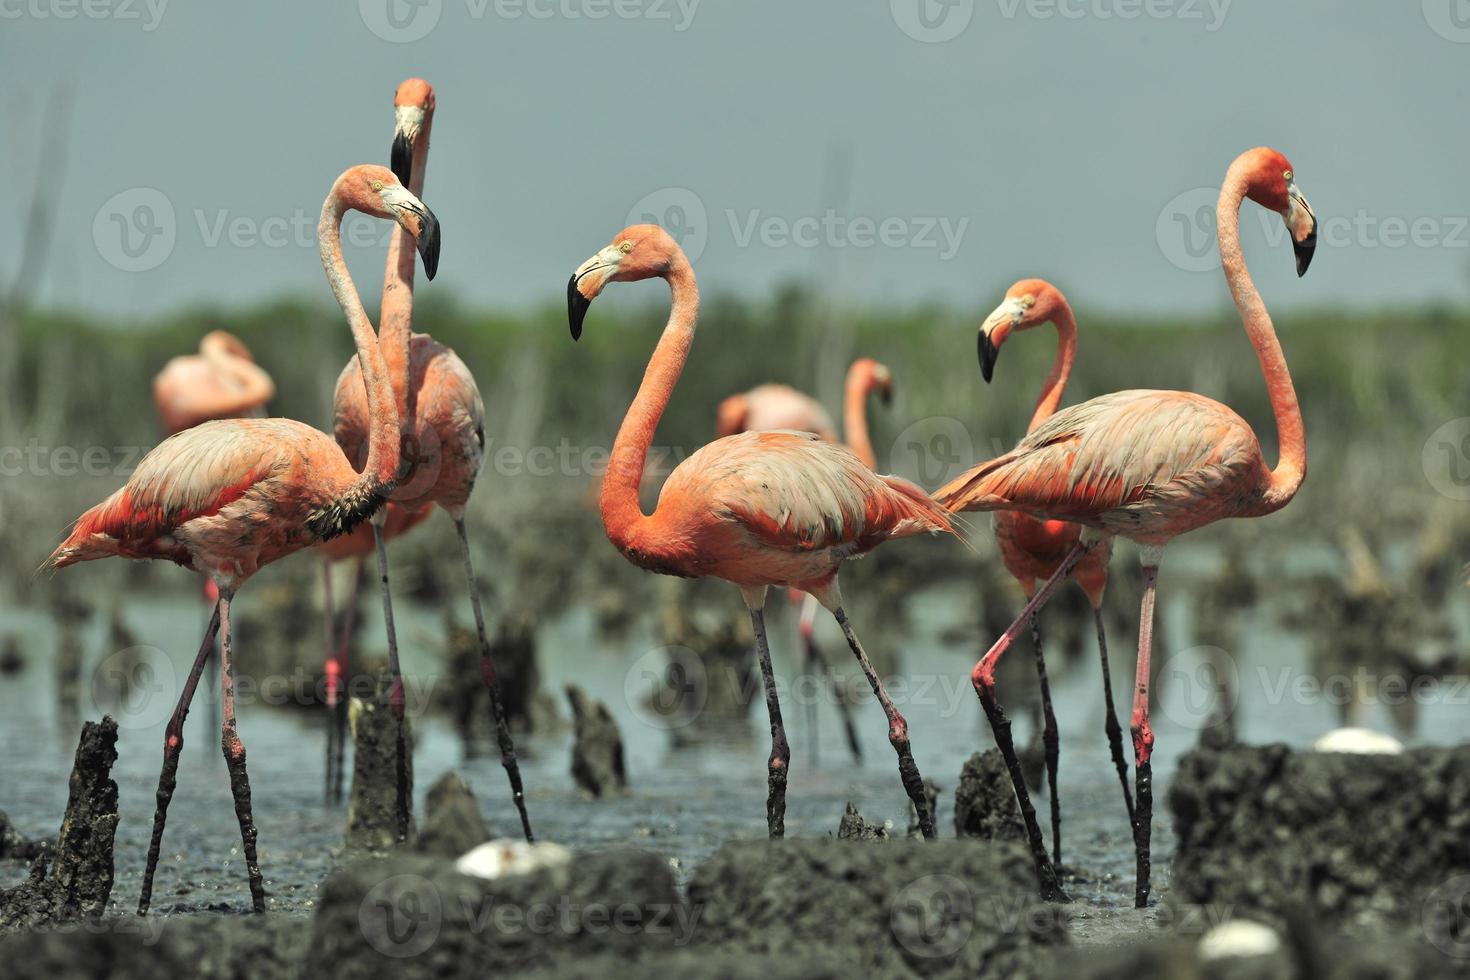 bra flamingo (phoenicopterus ruber) foto